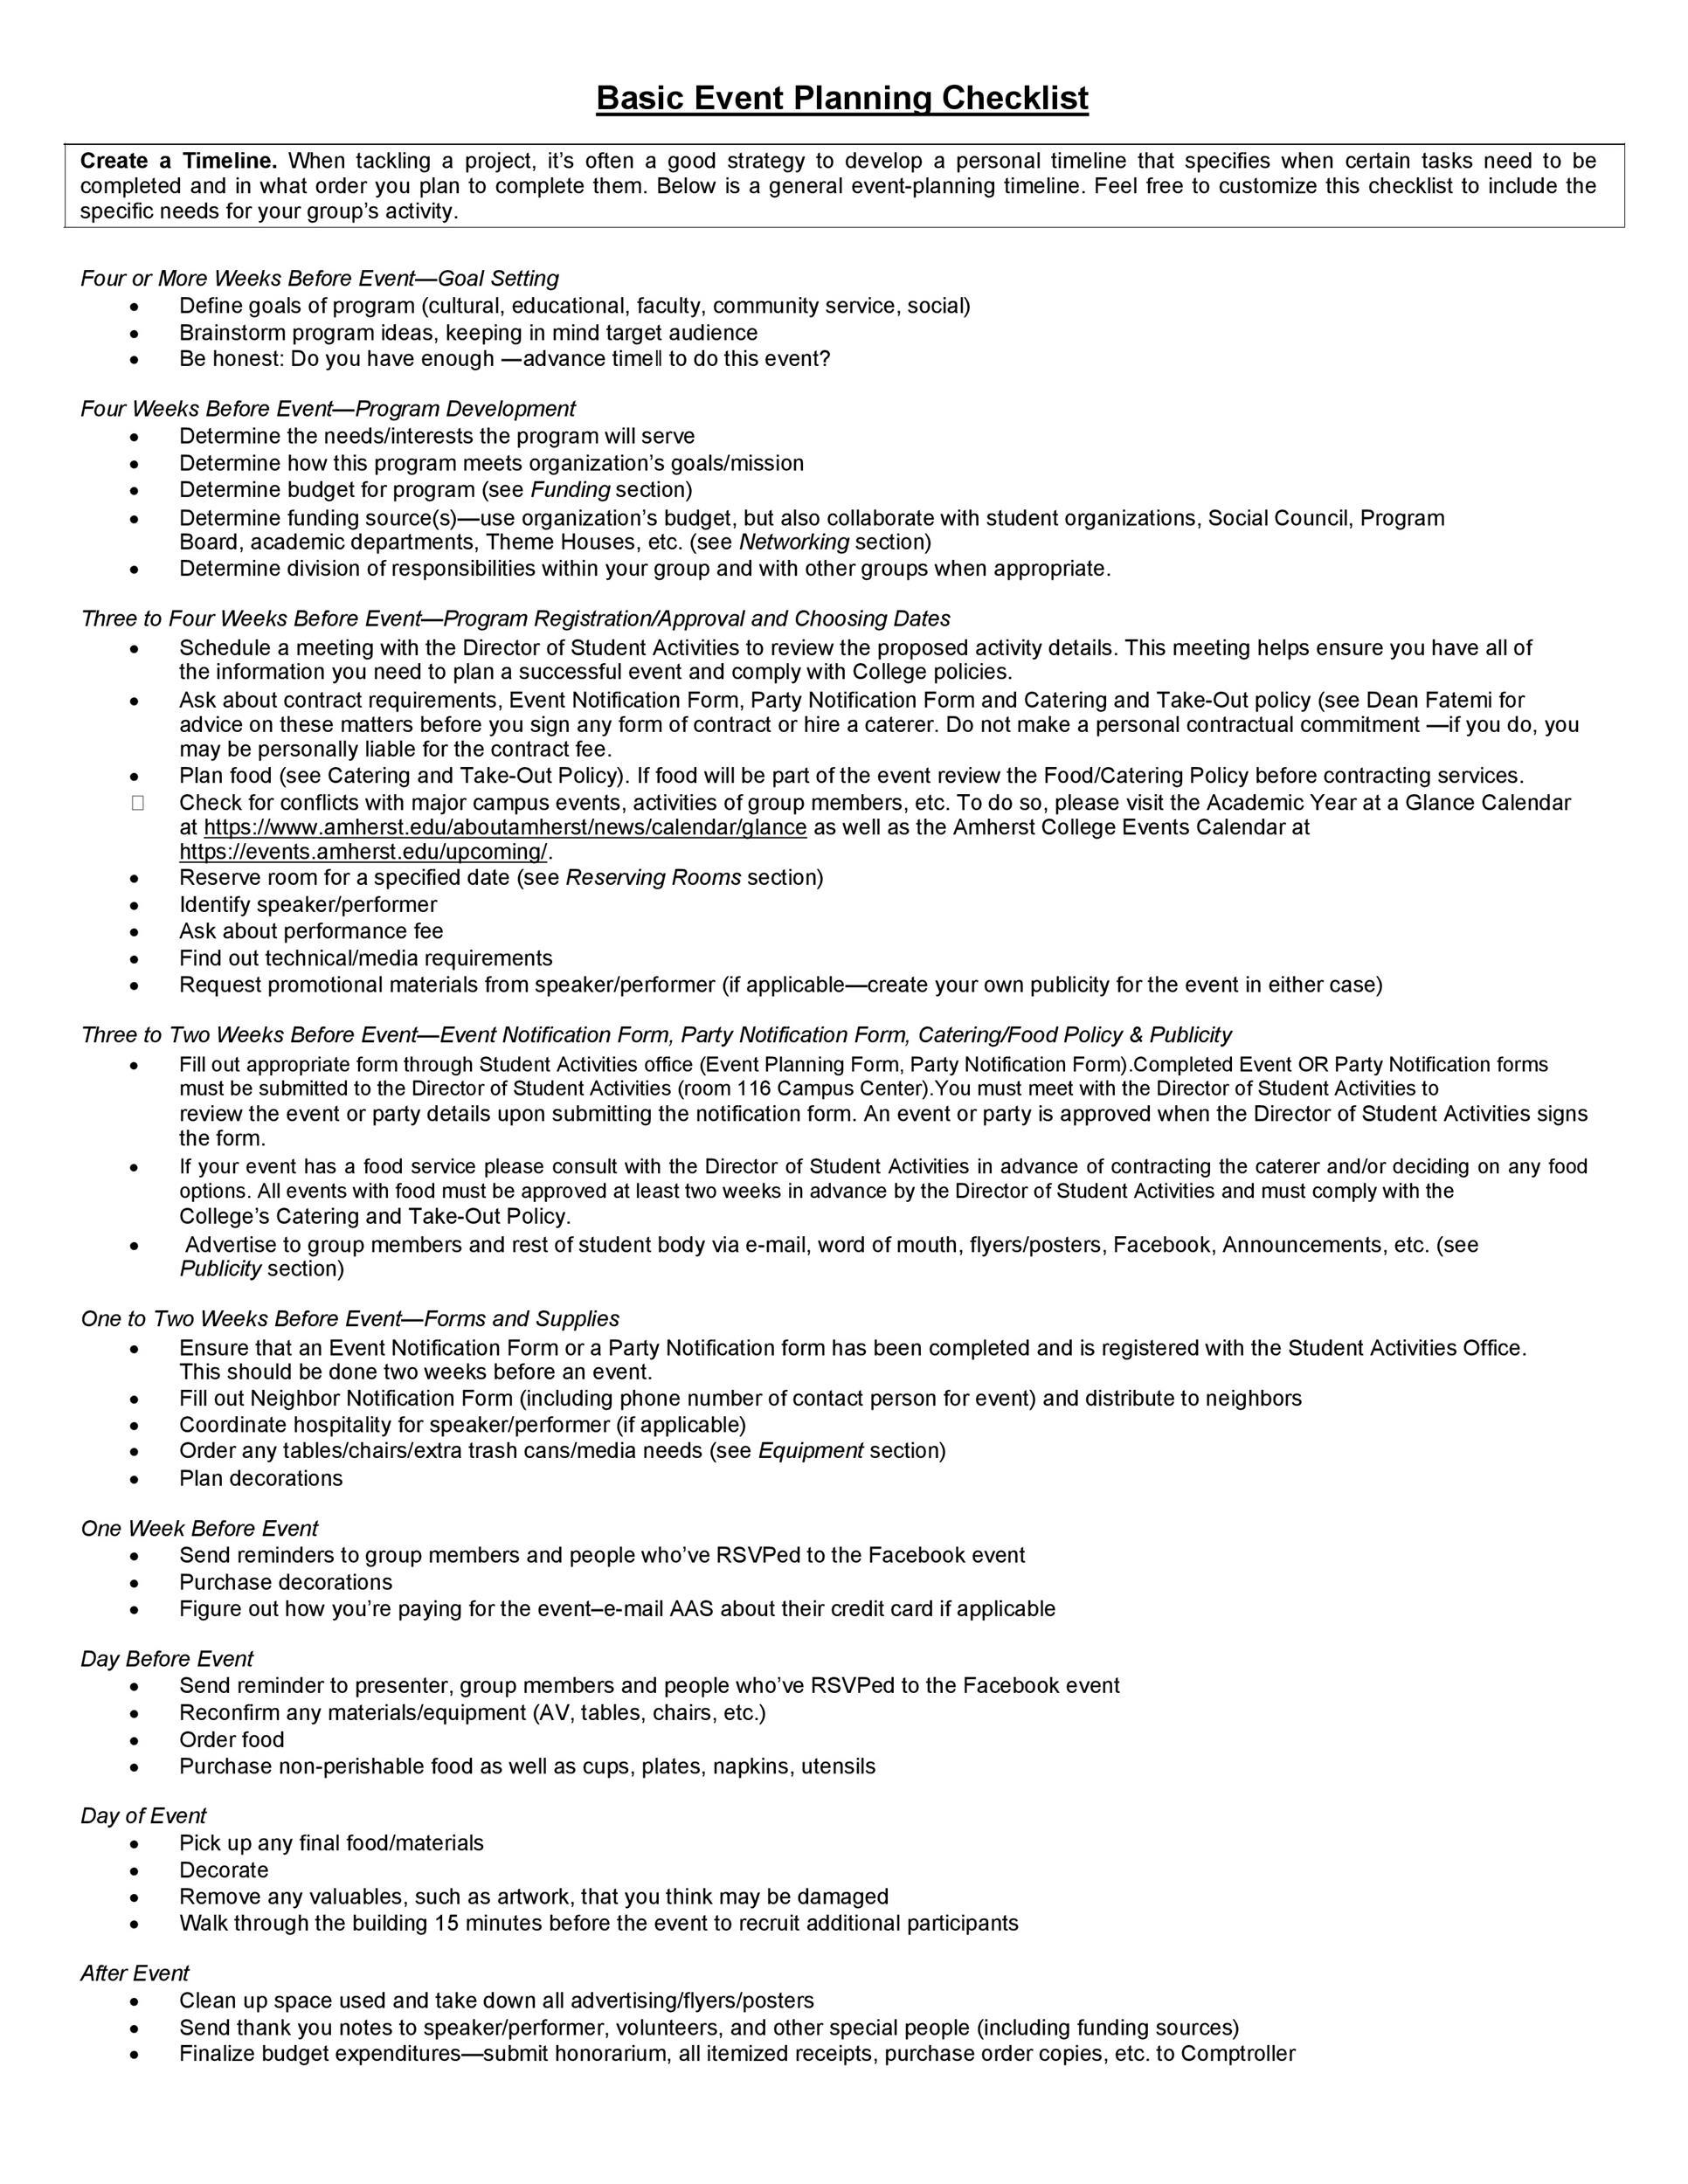 50 Professional Event Planning Checklist Templates Á… Templatelab